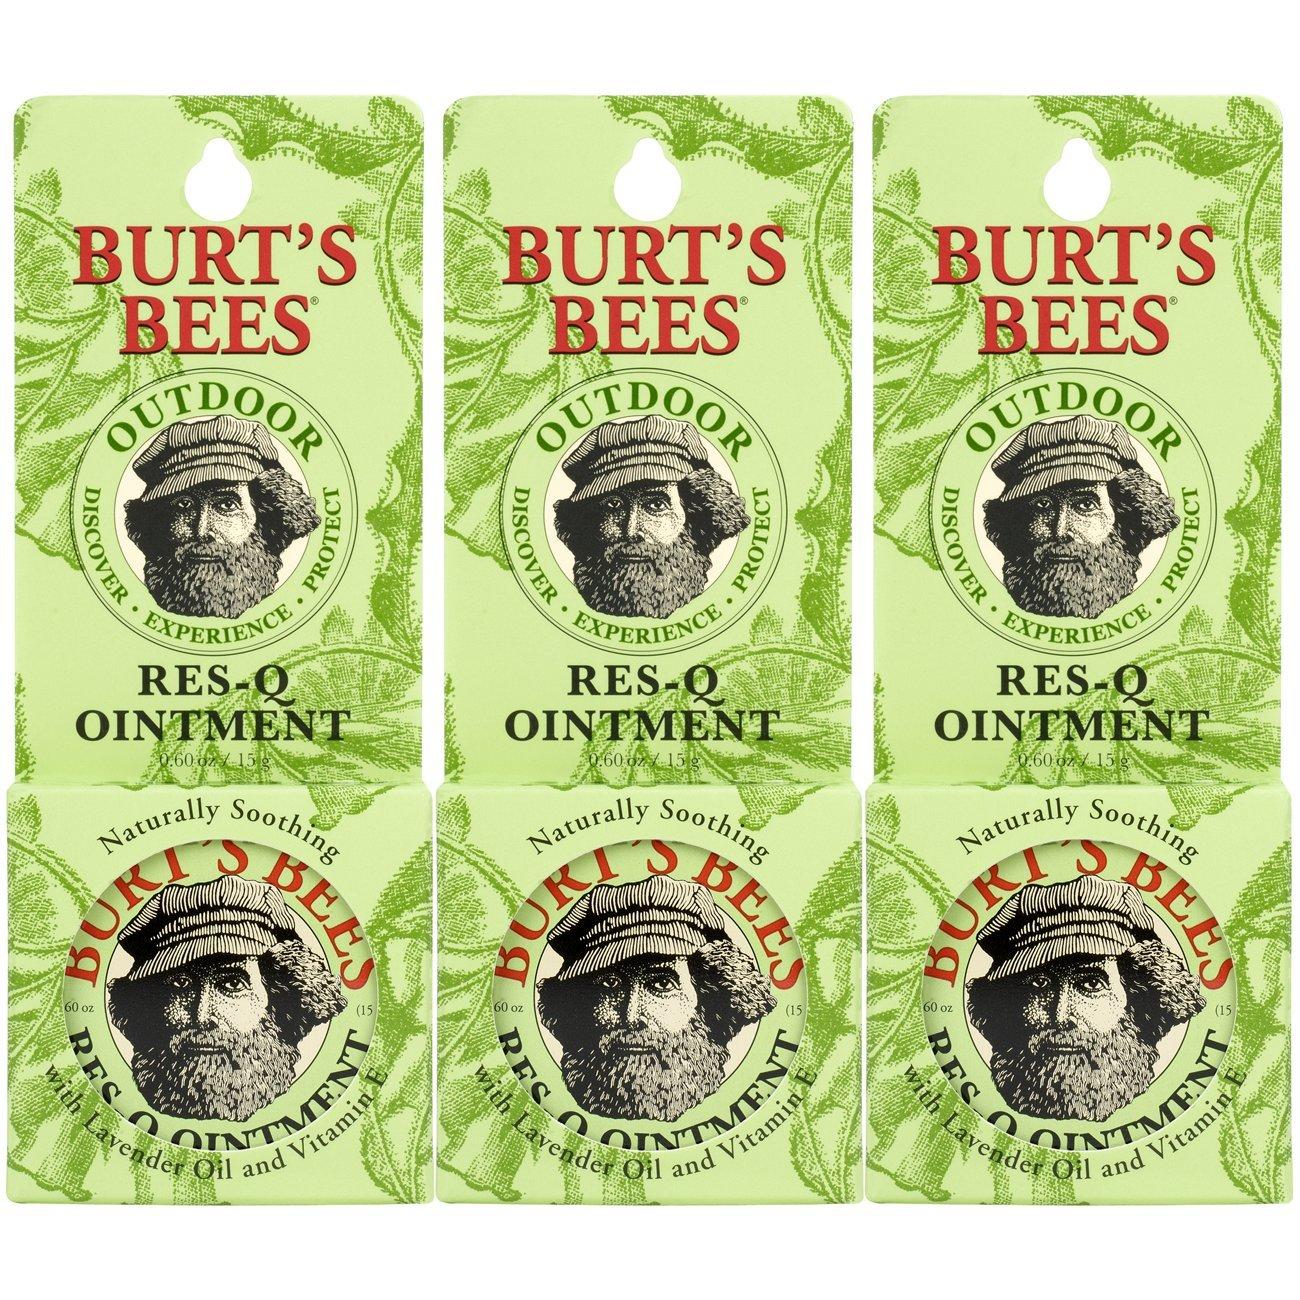 Burt 's Bees Doctor Burt' s RES de Q de Ointment 18ml Ointment (3-Pack) (Lociones) Burt' s Bees 77699-20